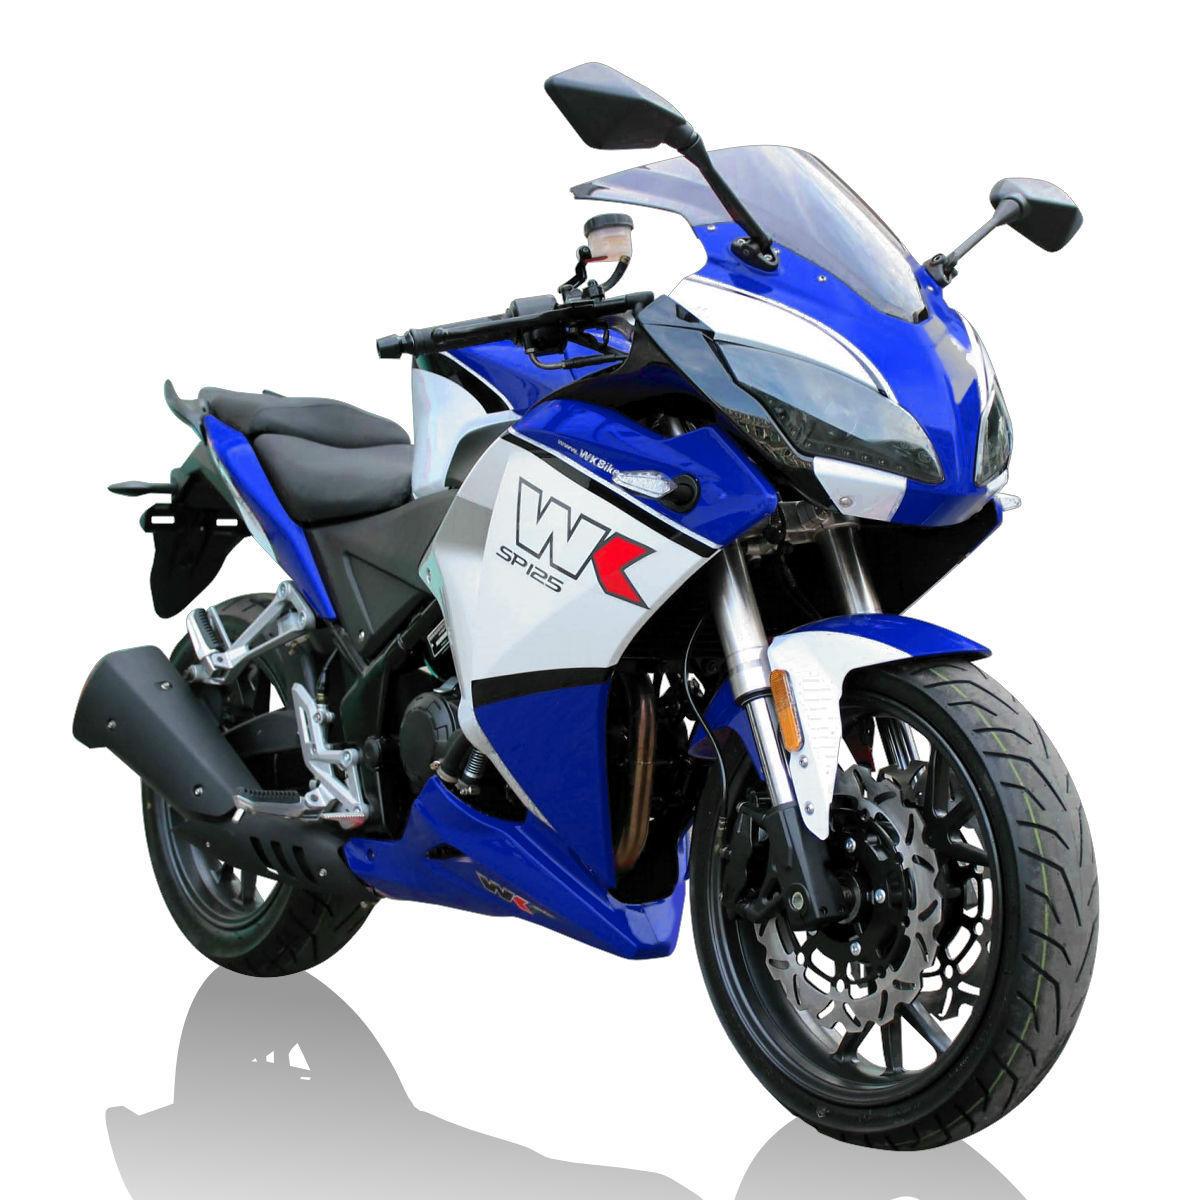 wk sp125 125cc super sport motorcycle 2498 otr liquid cooled finance me. Black Bedroom Furniture Sets. Home Design Ideas